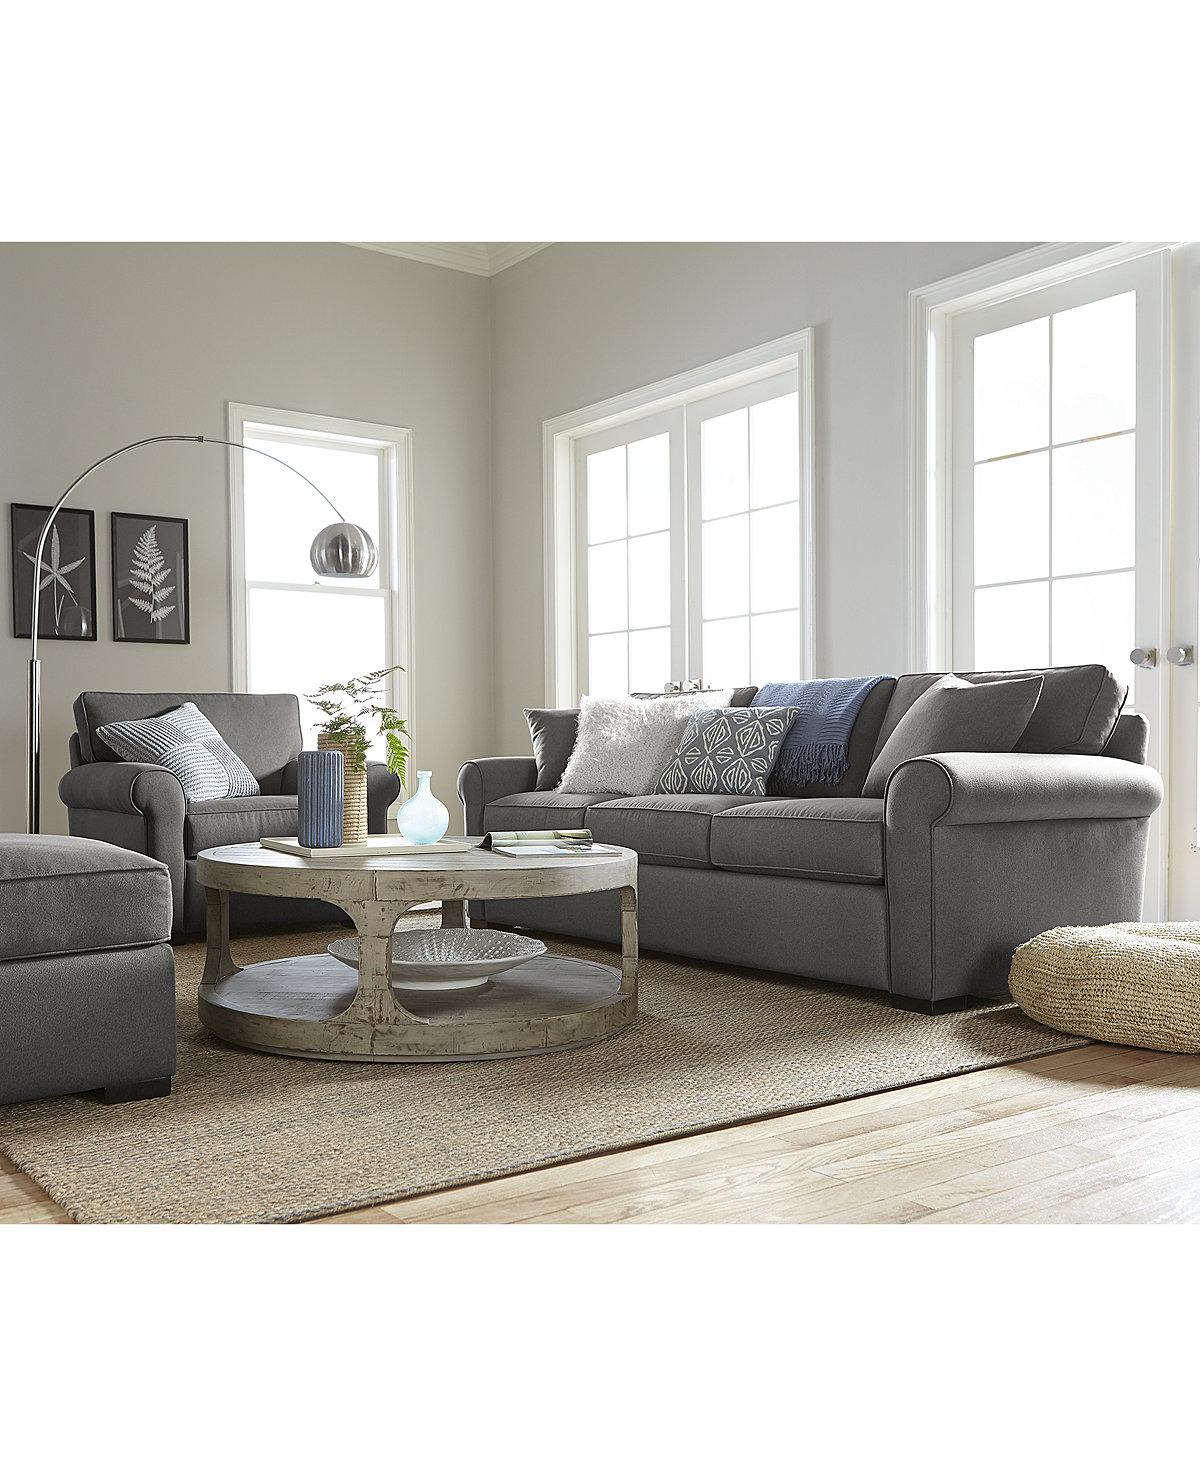 kenton fabric sofa parchment england furniture sofas corner 3 seats ott version on